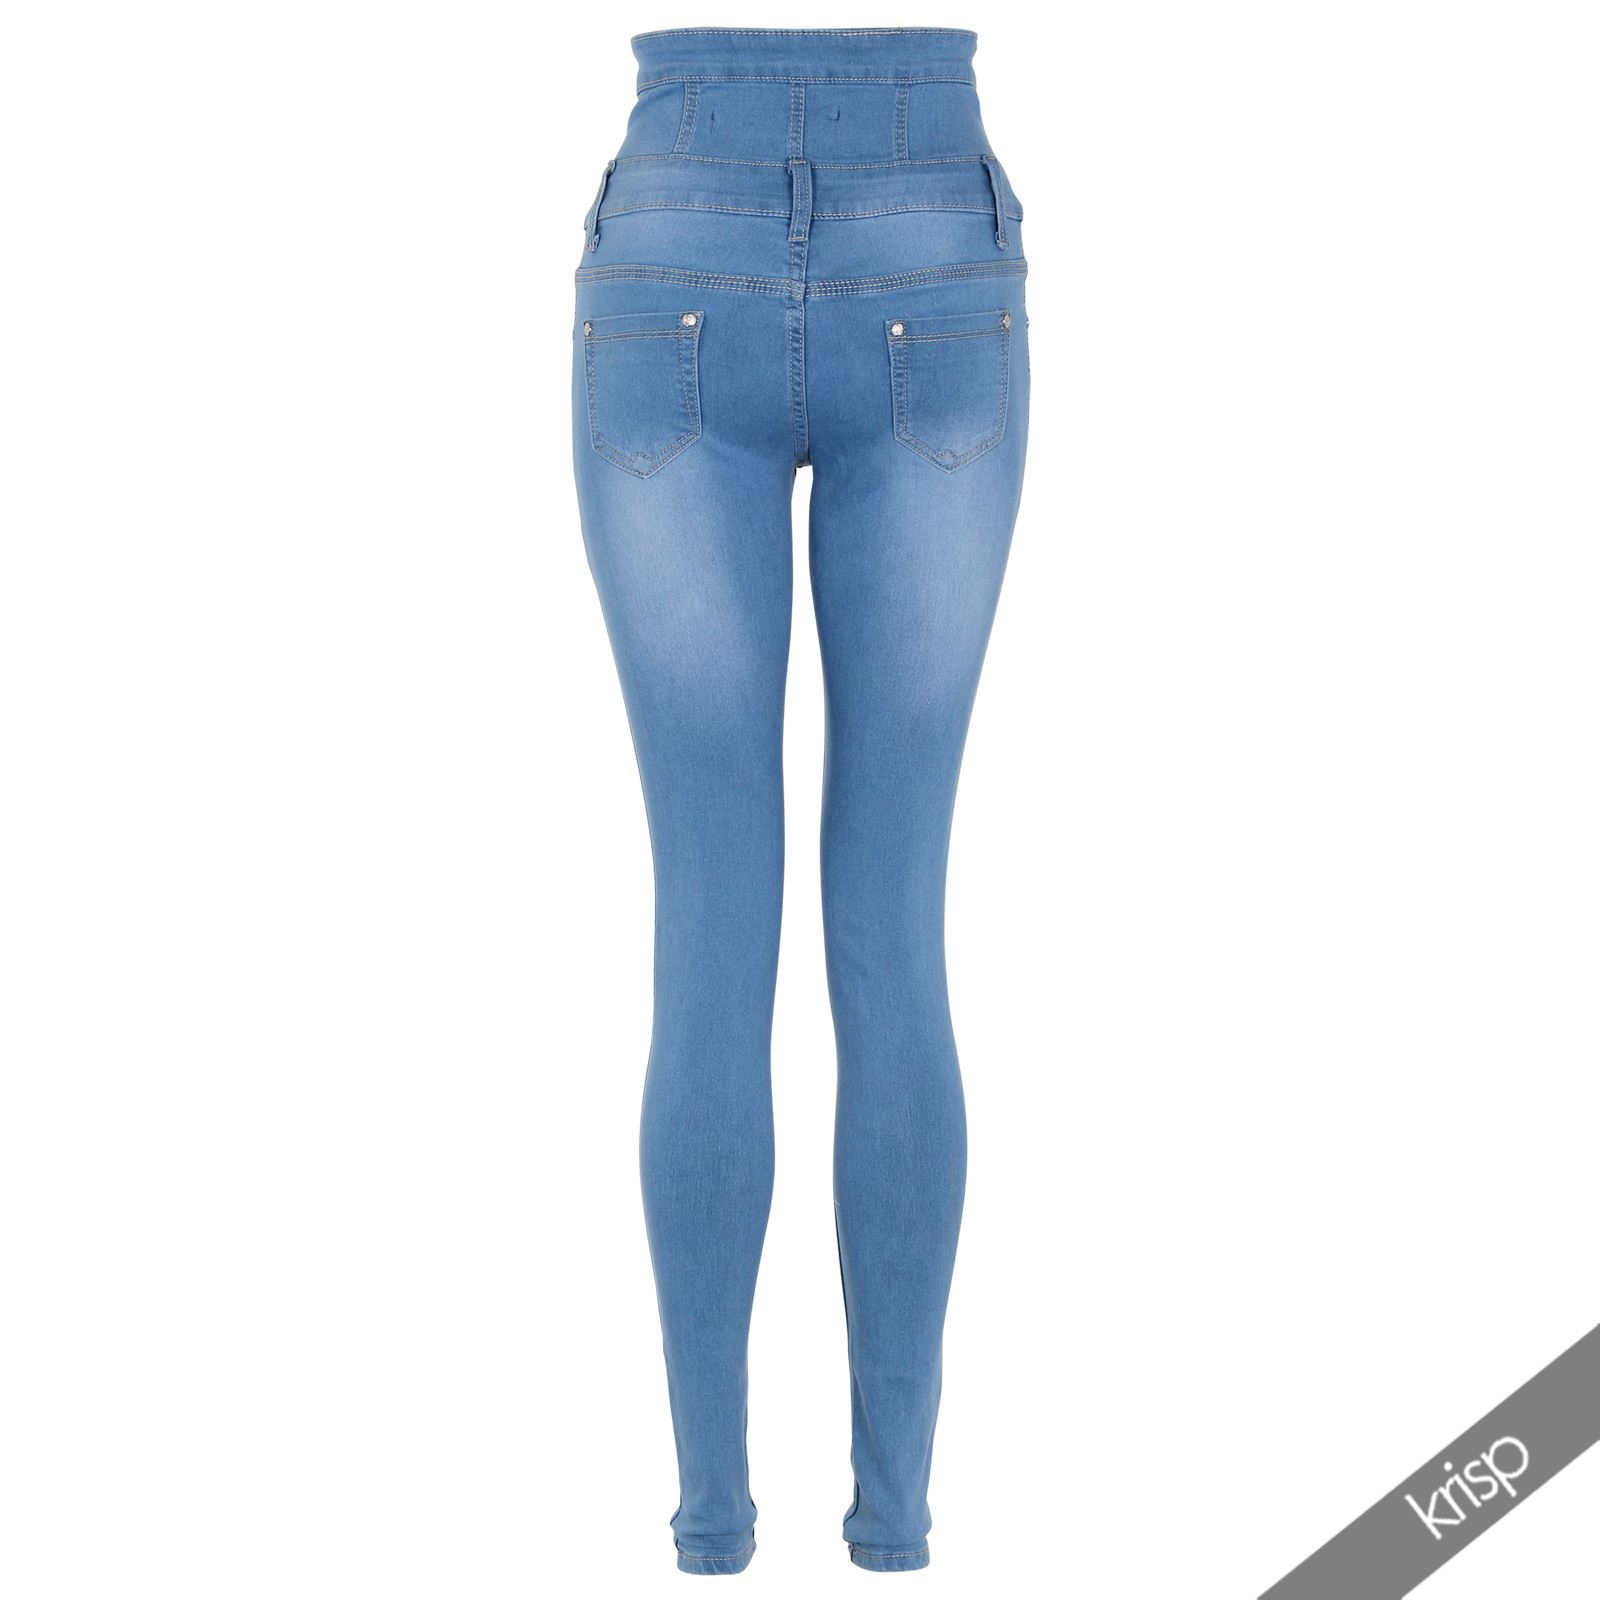 jeans skinny slim taille haute femme pantalon denim. Black Bedroom Furniture Sets. Home Design Ideas